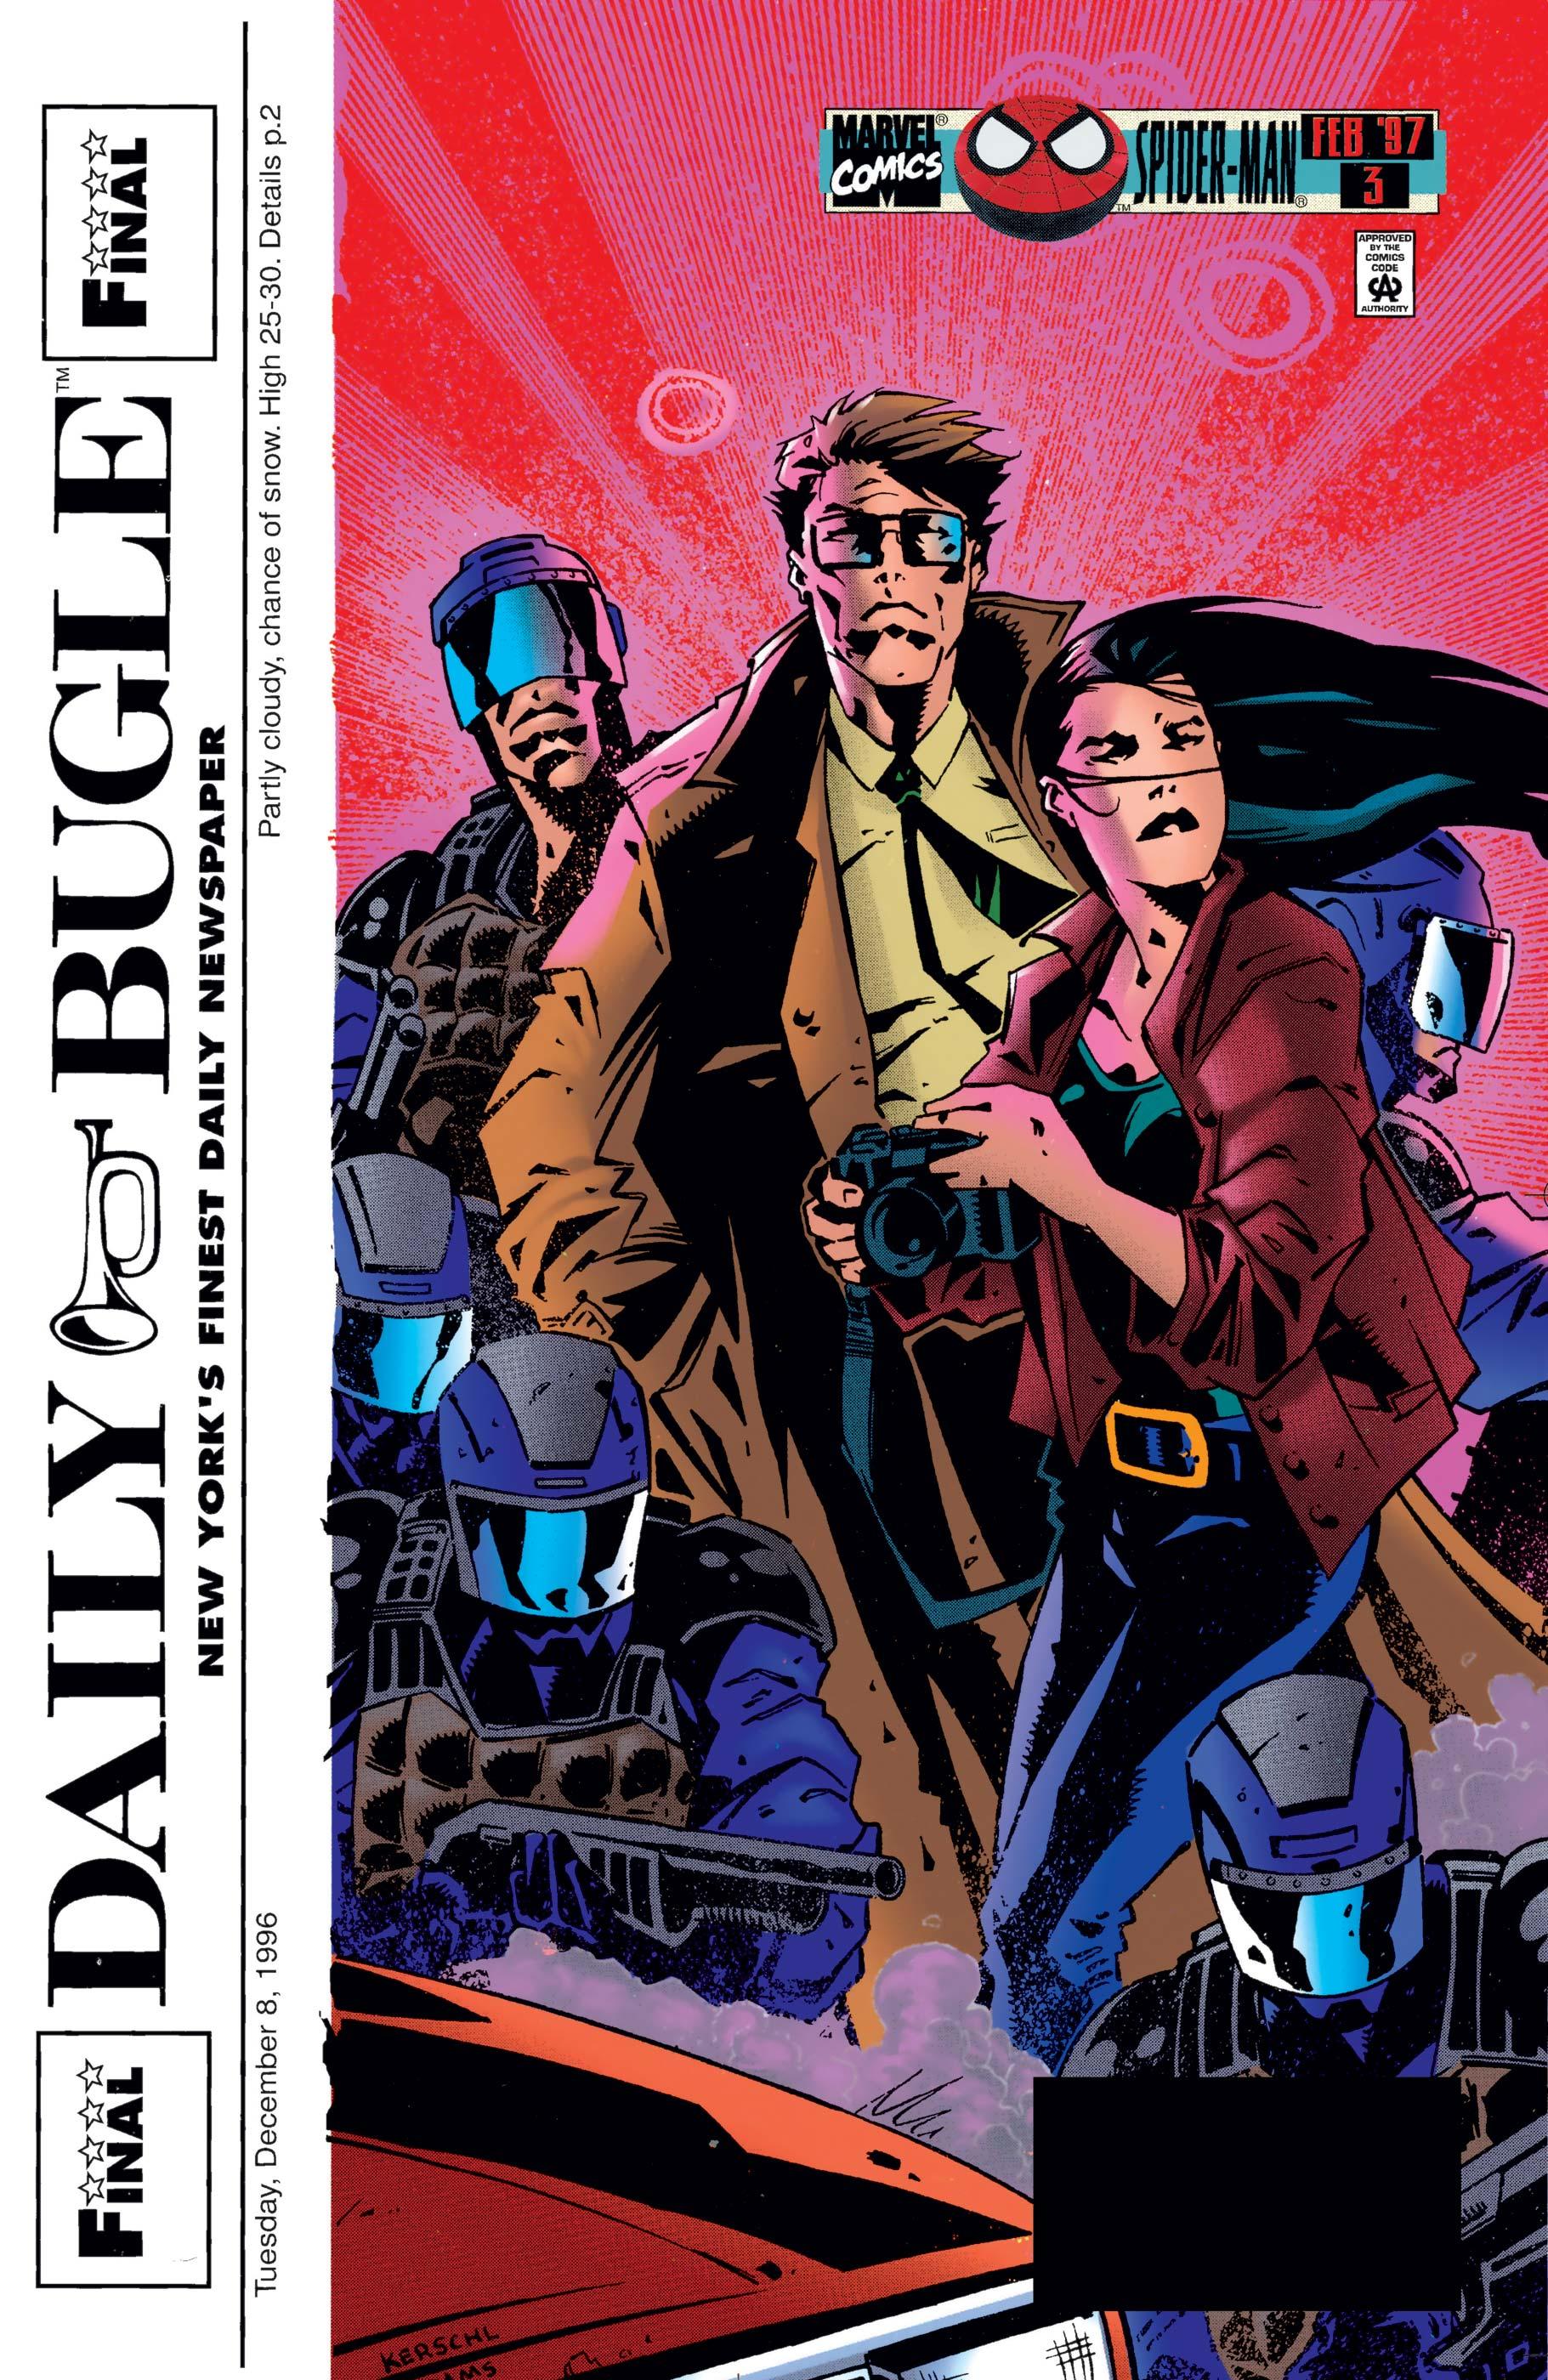 Daily Bugle (1996) #3